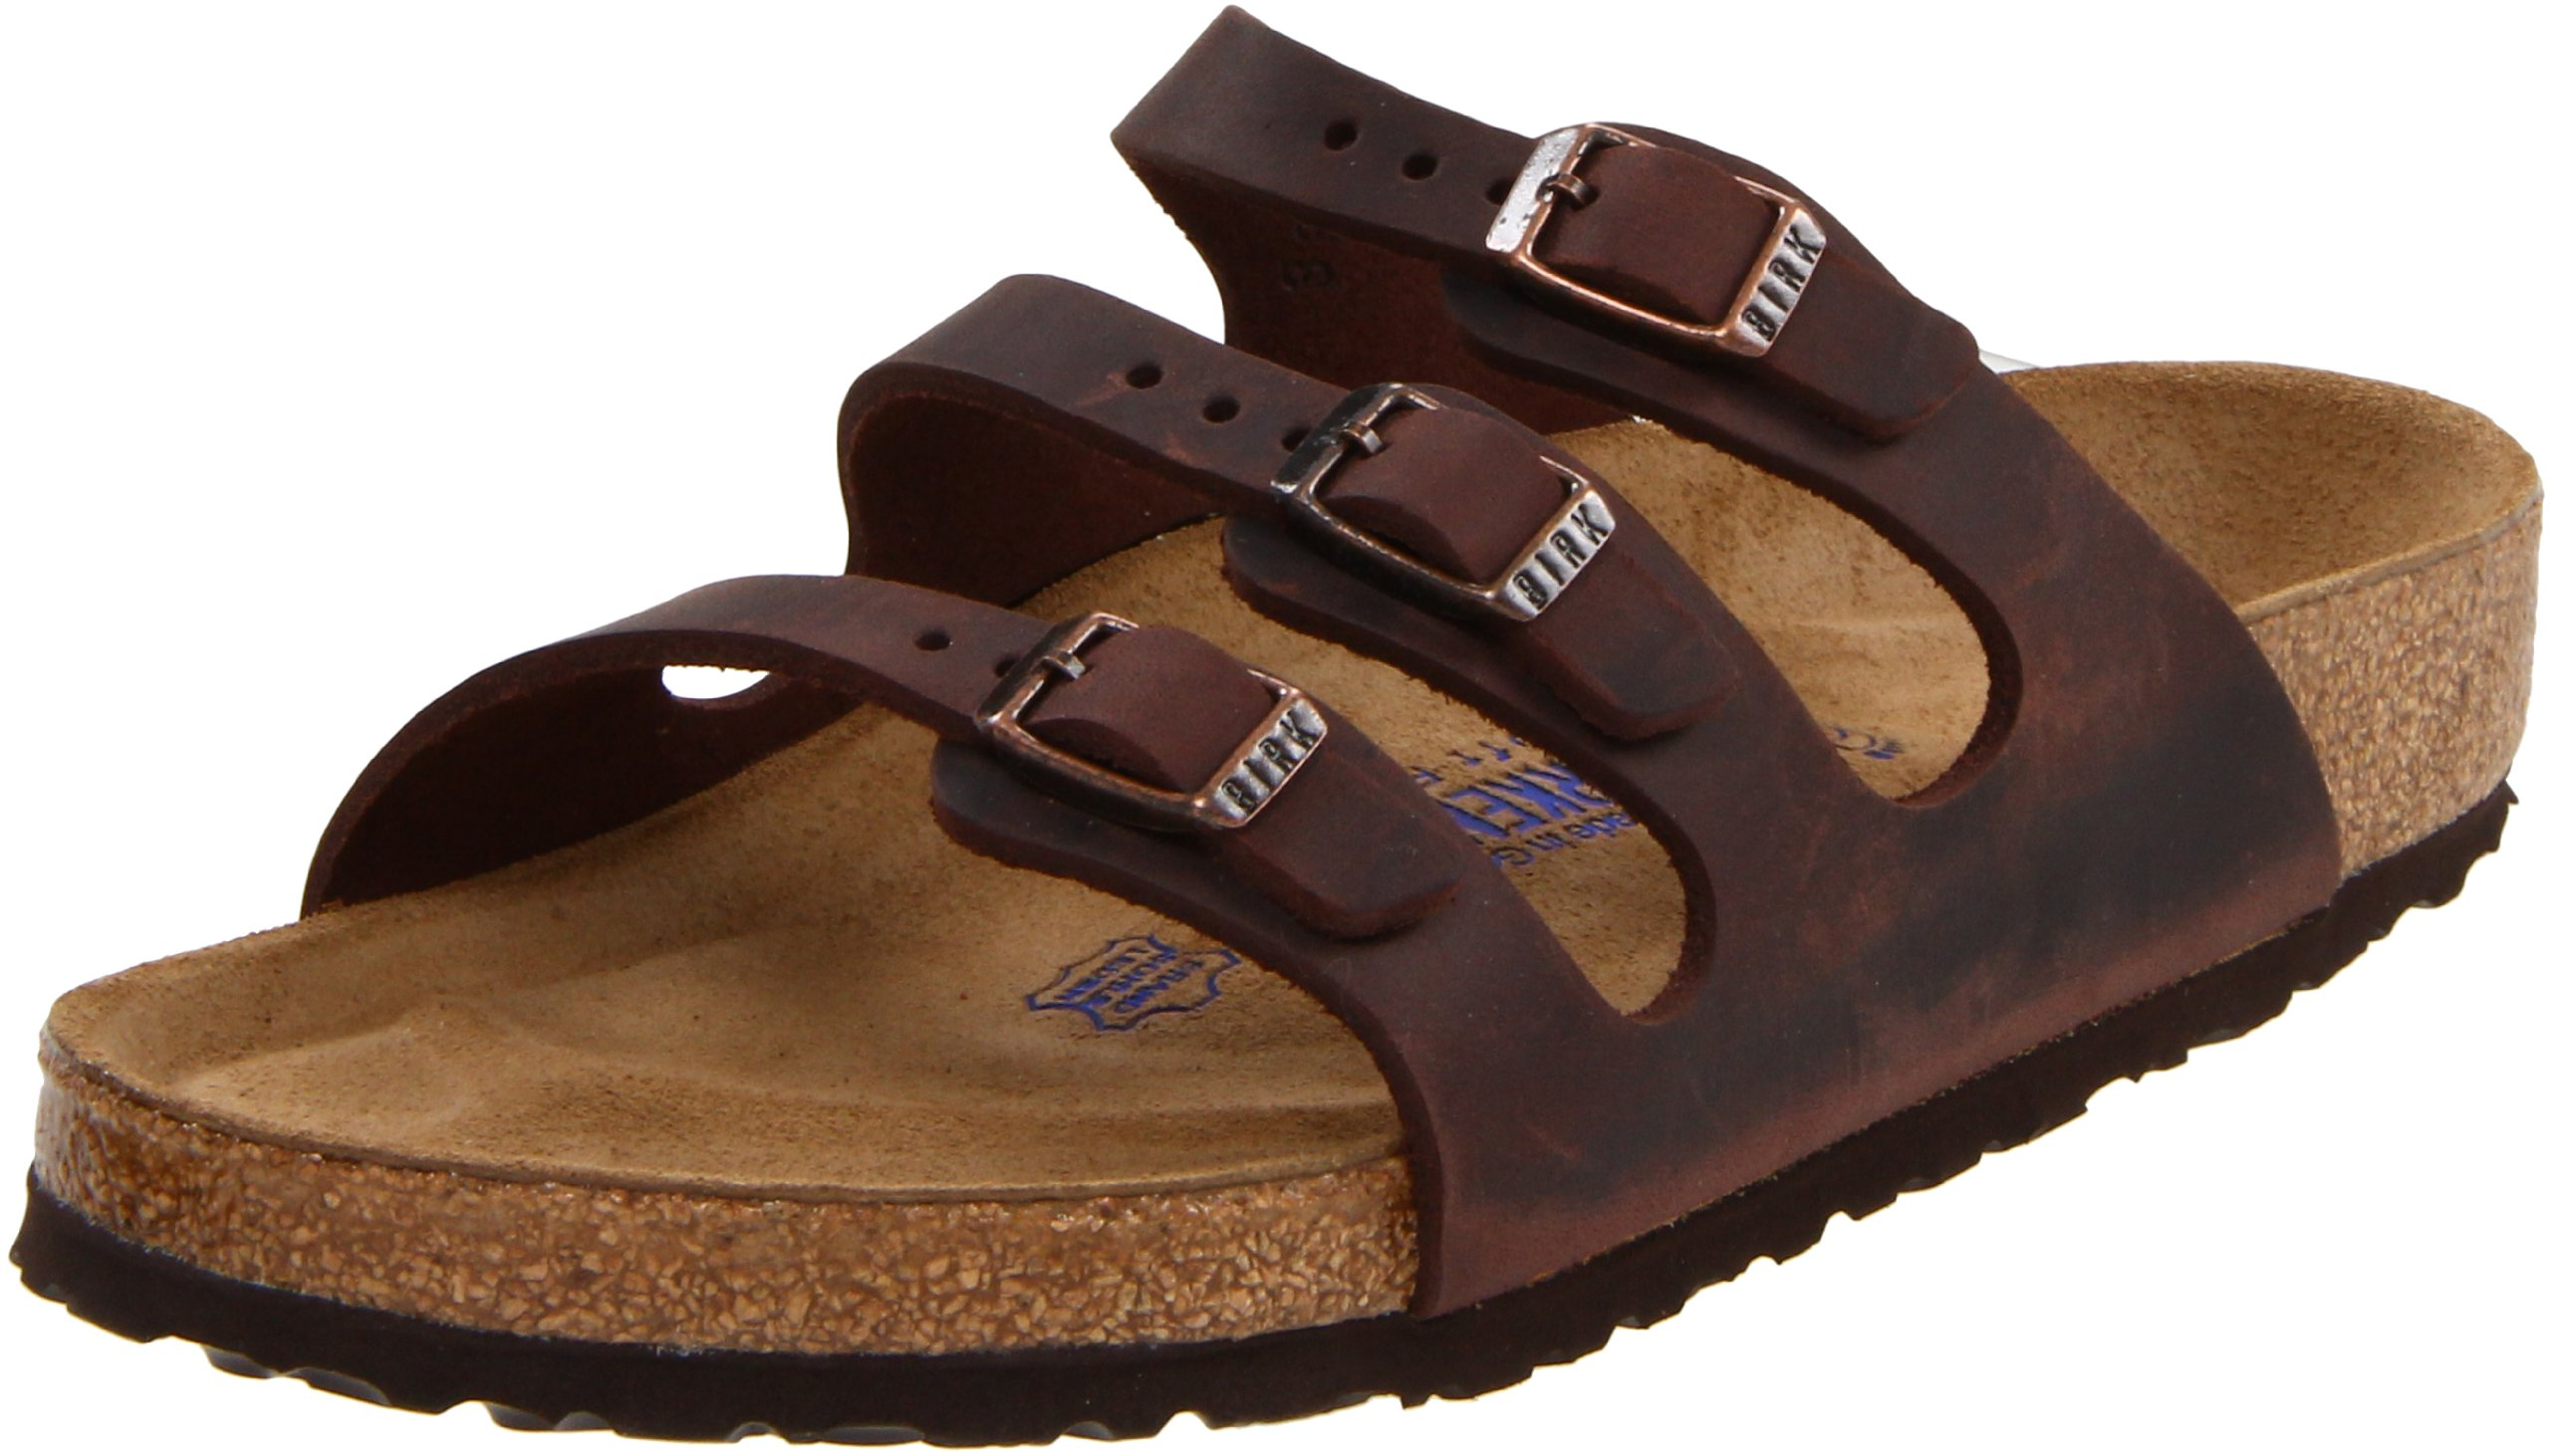 Birkenstock Women's Florida Soft Footbed Birko-Flor  Habana Waxy Leather Sandals - 39 M EU / 8-8.5 B(M) US by Birkenstock